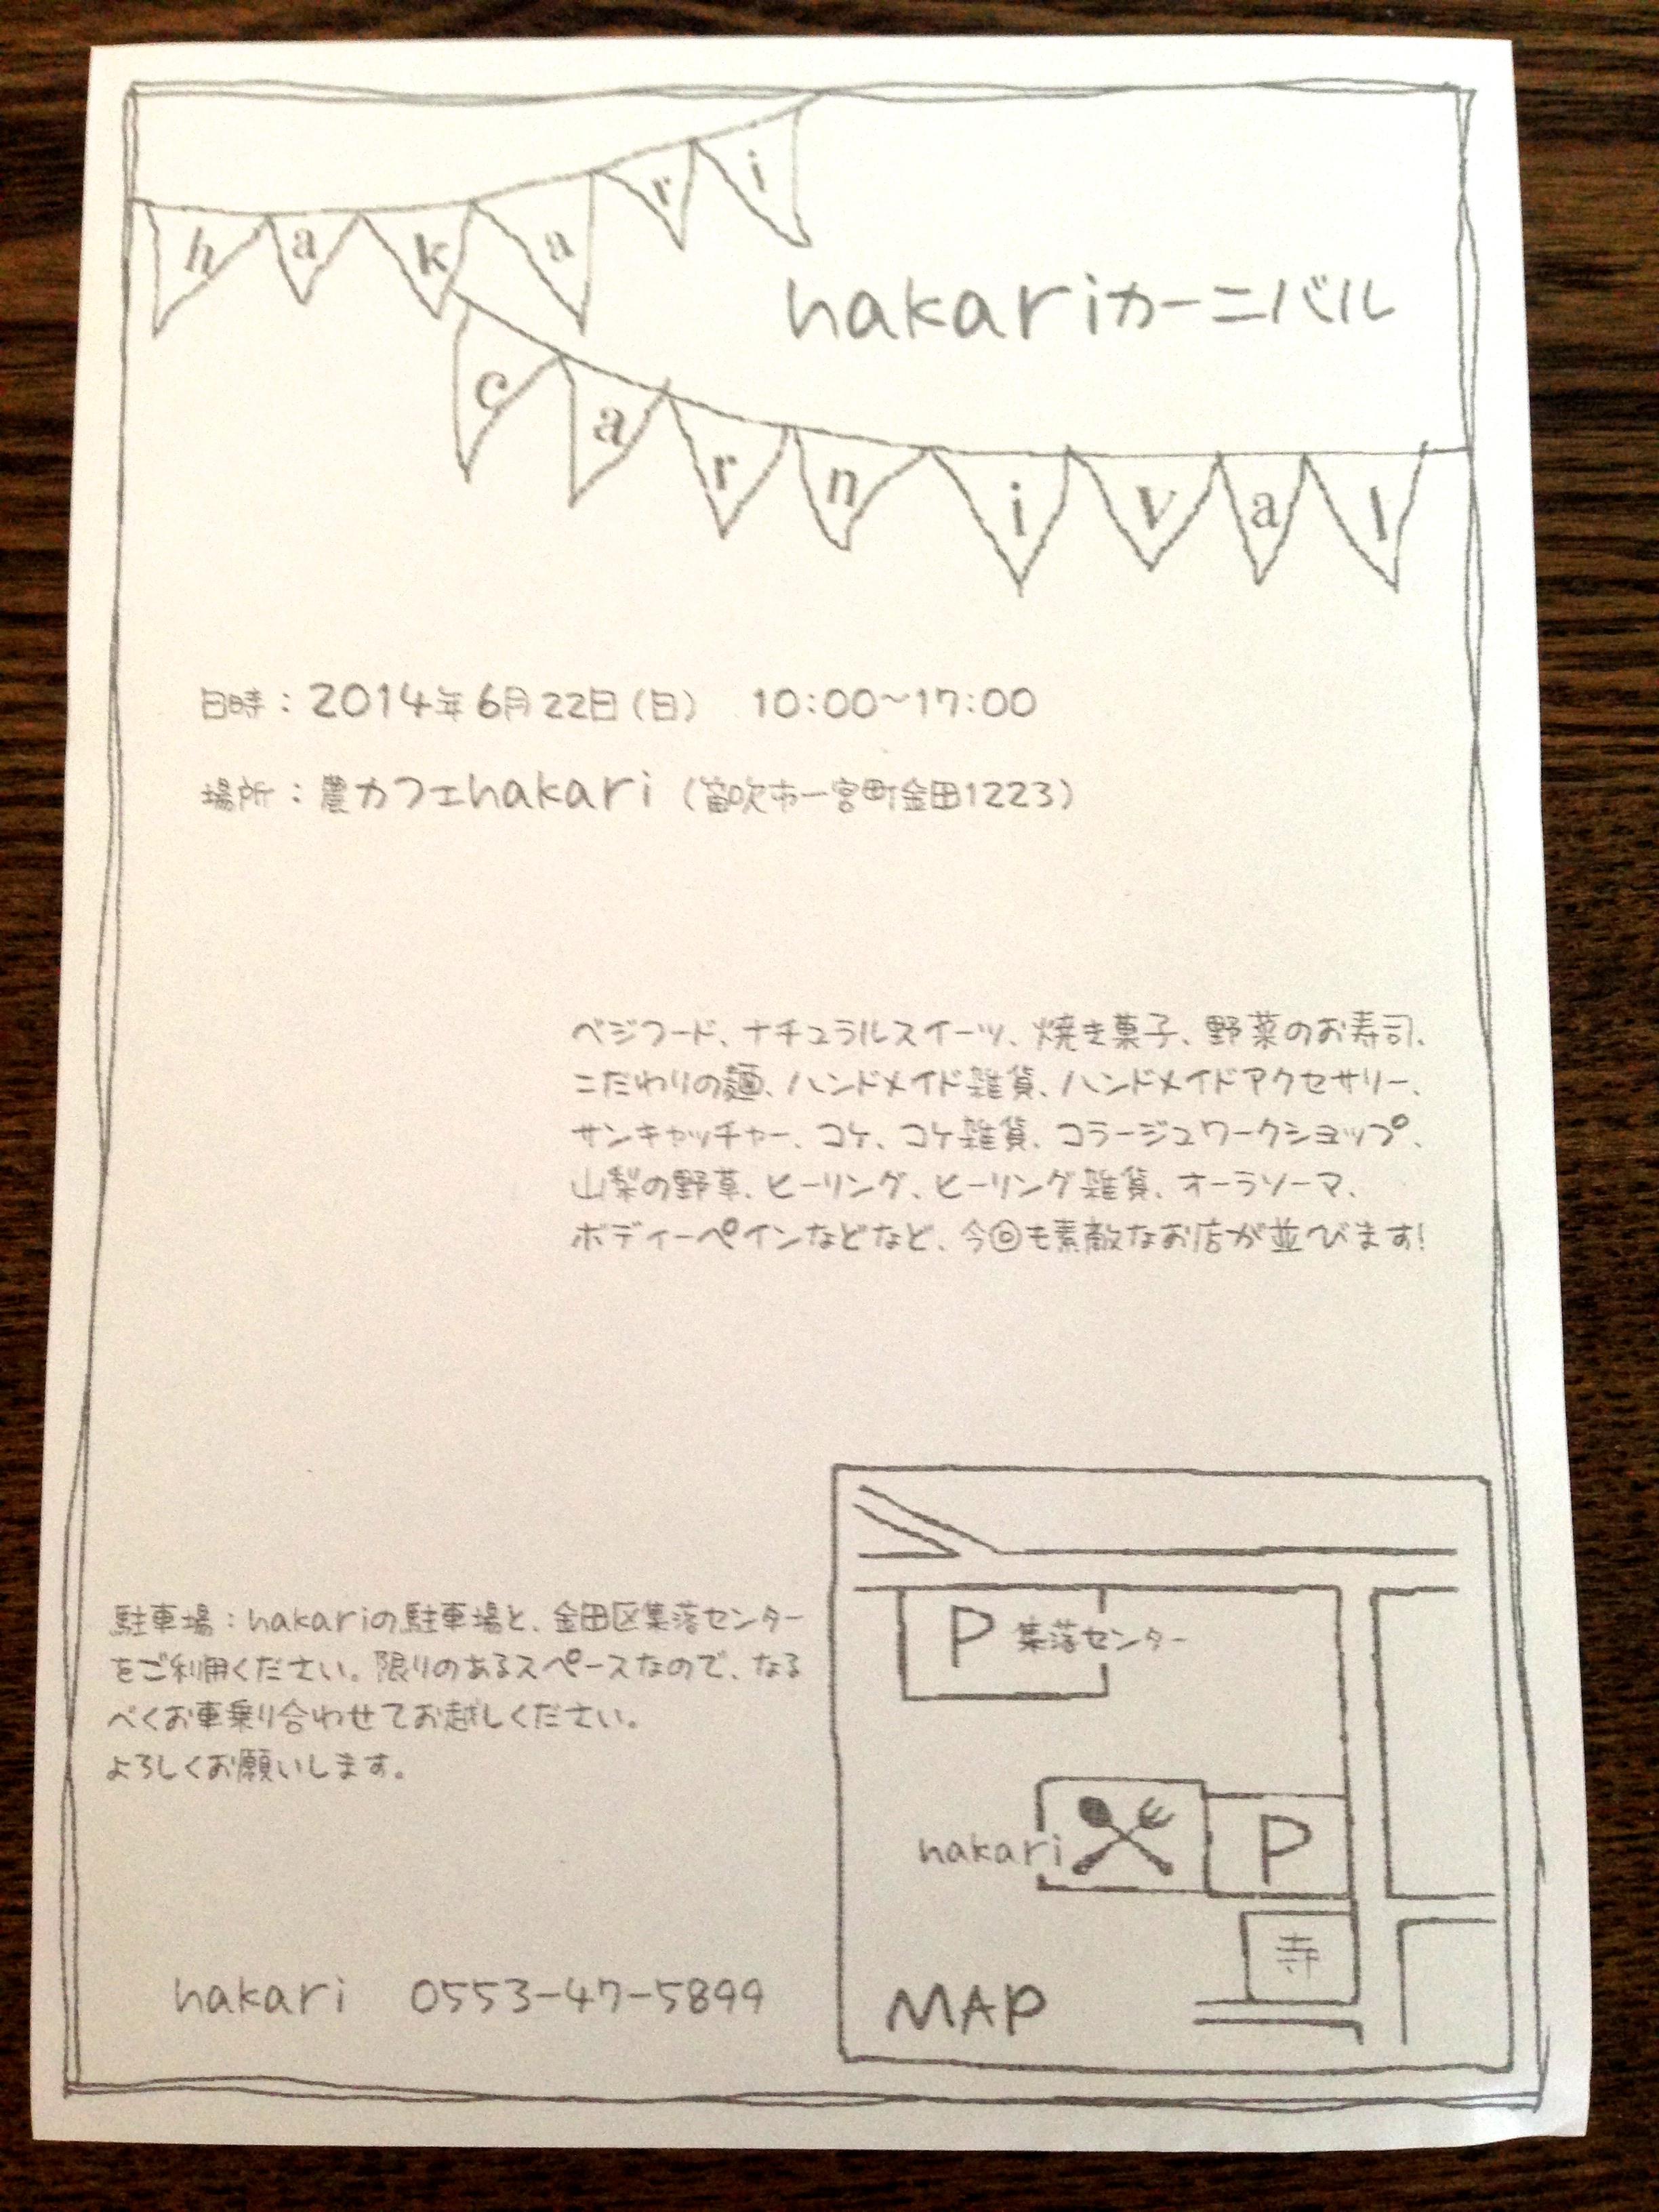 hakari_carnival_201406